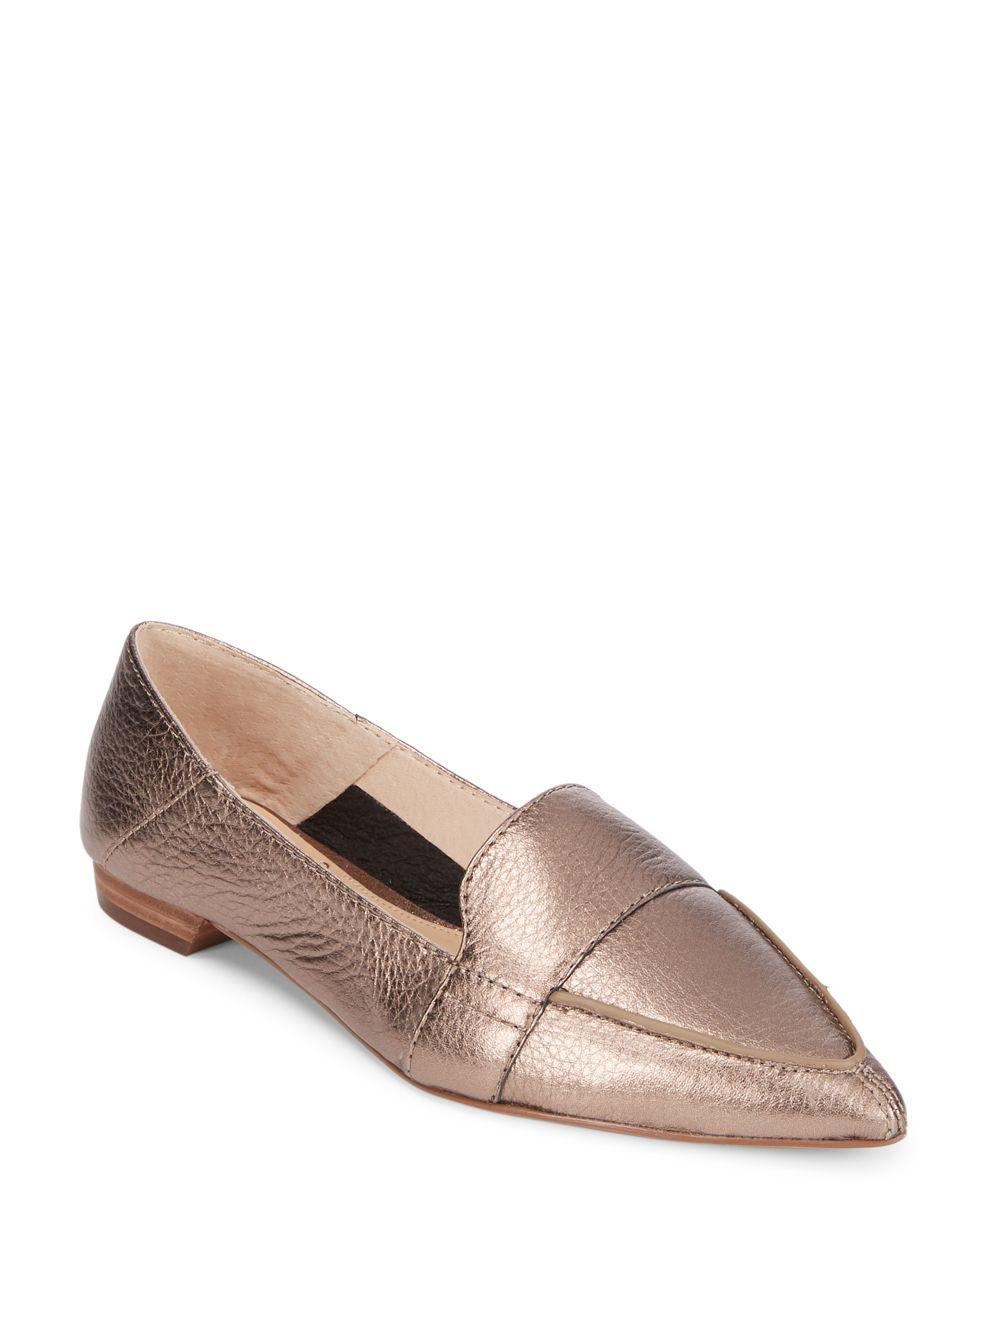 64a4948da3f Vince Camuto Maita Casual Leather Flats in Metallic - Save 6% - Lyst